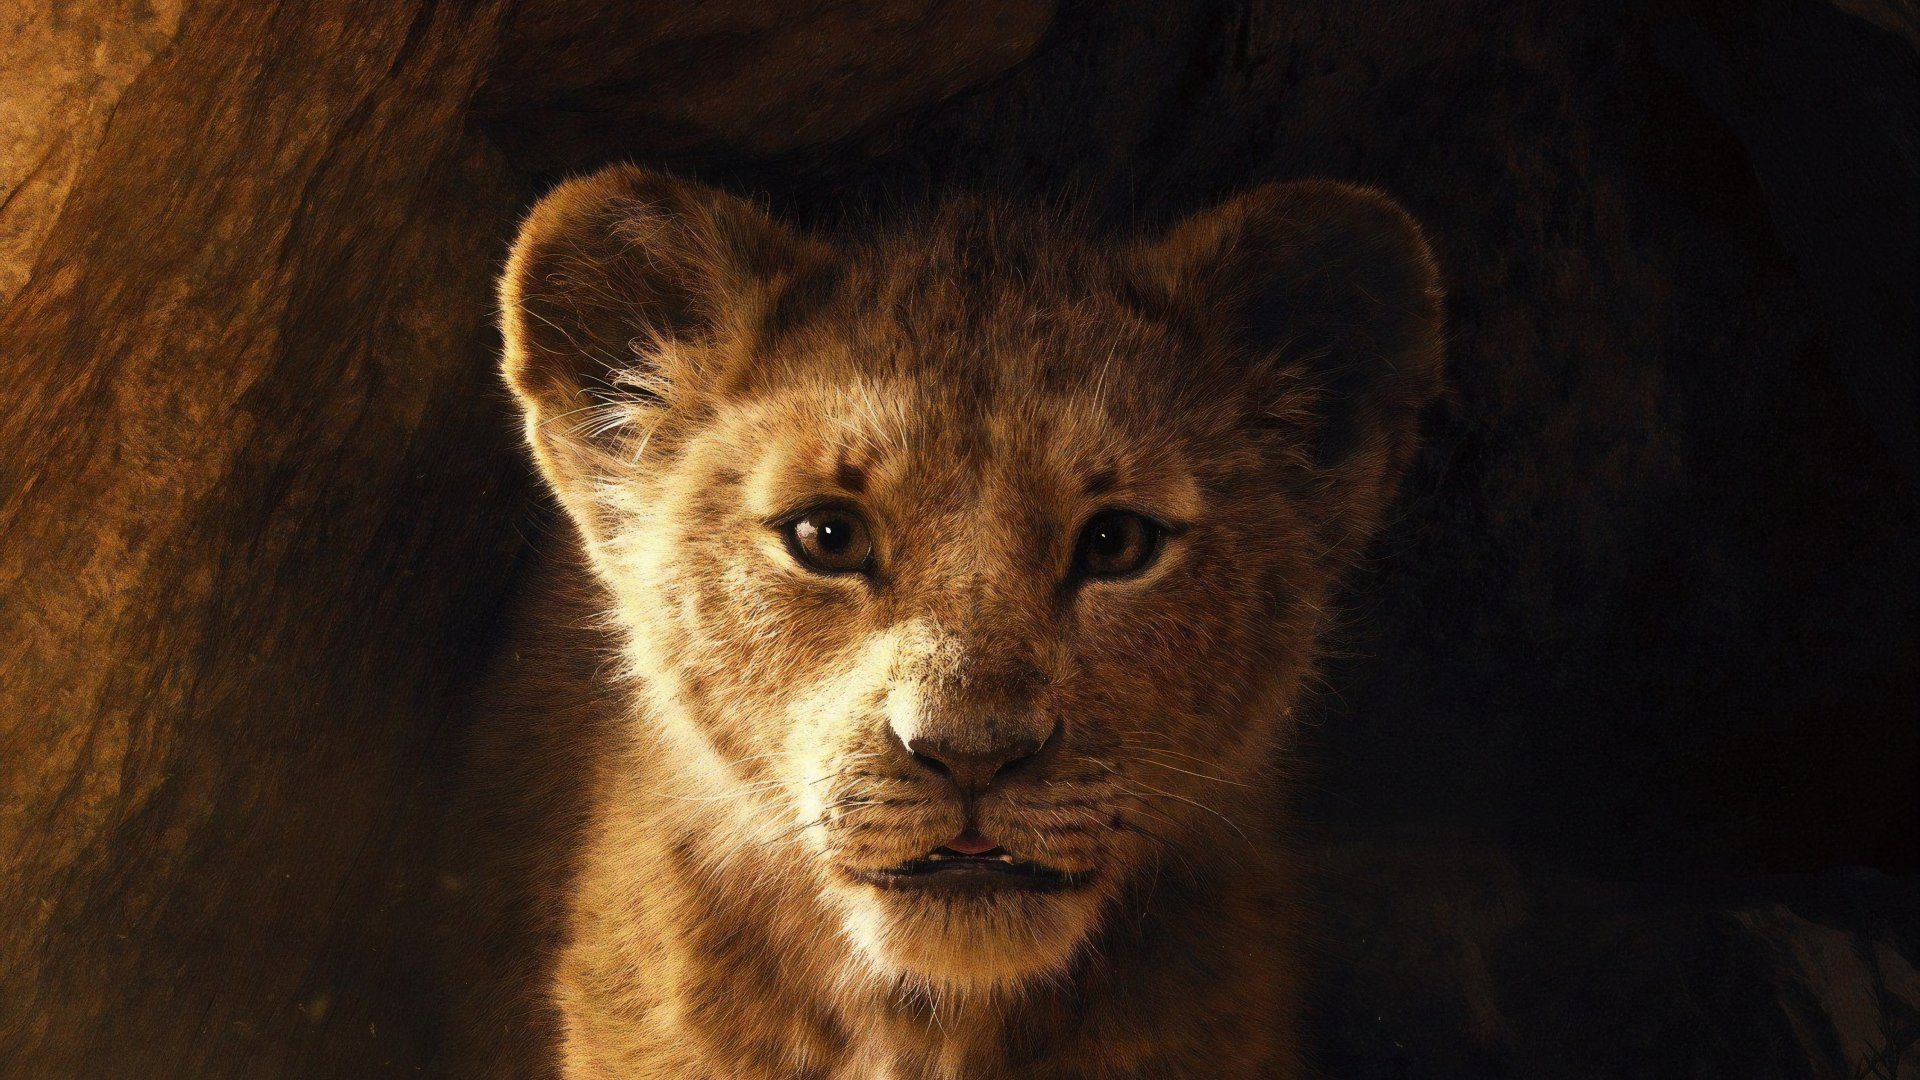 8 The Lion King 2019 Fonds D Ecran Hd Arriere Plans Wallpaper